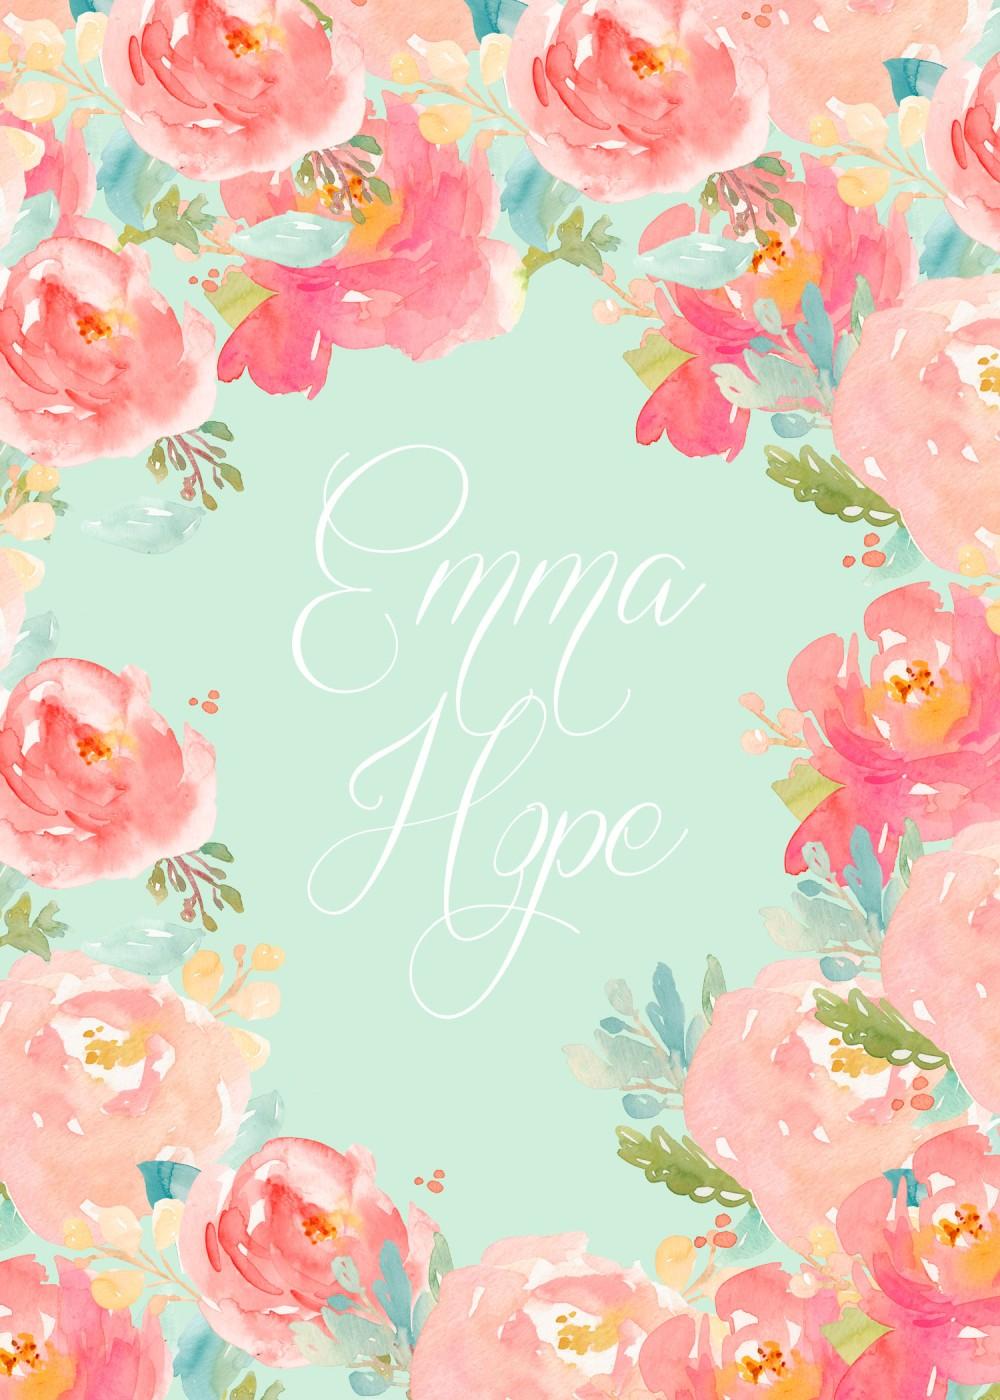 EmmaHope